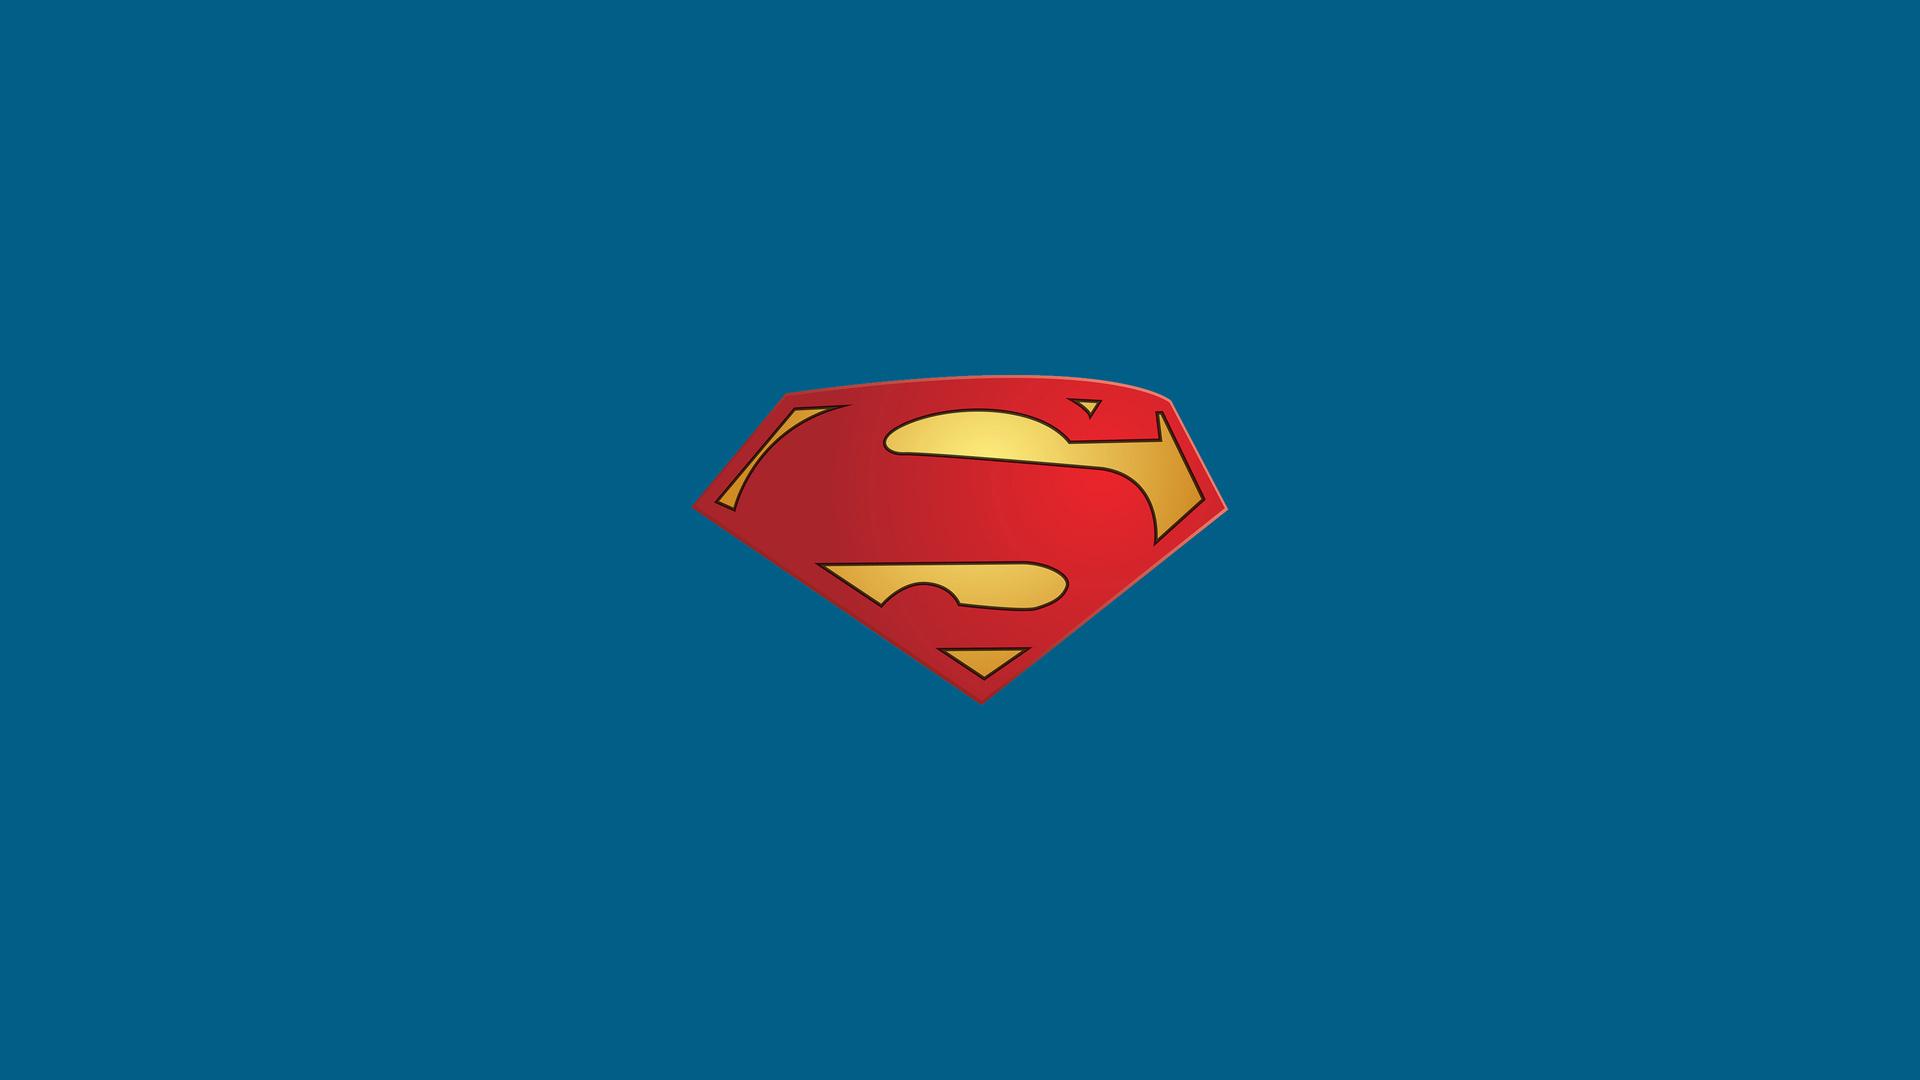 1920x1080 superman logo minimal laptop full hd 1080p hd 4k superman logo minimal sug voltagebd Choice Image